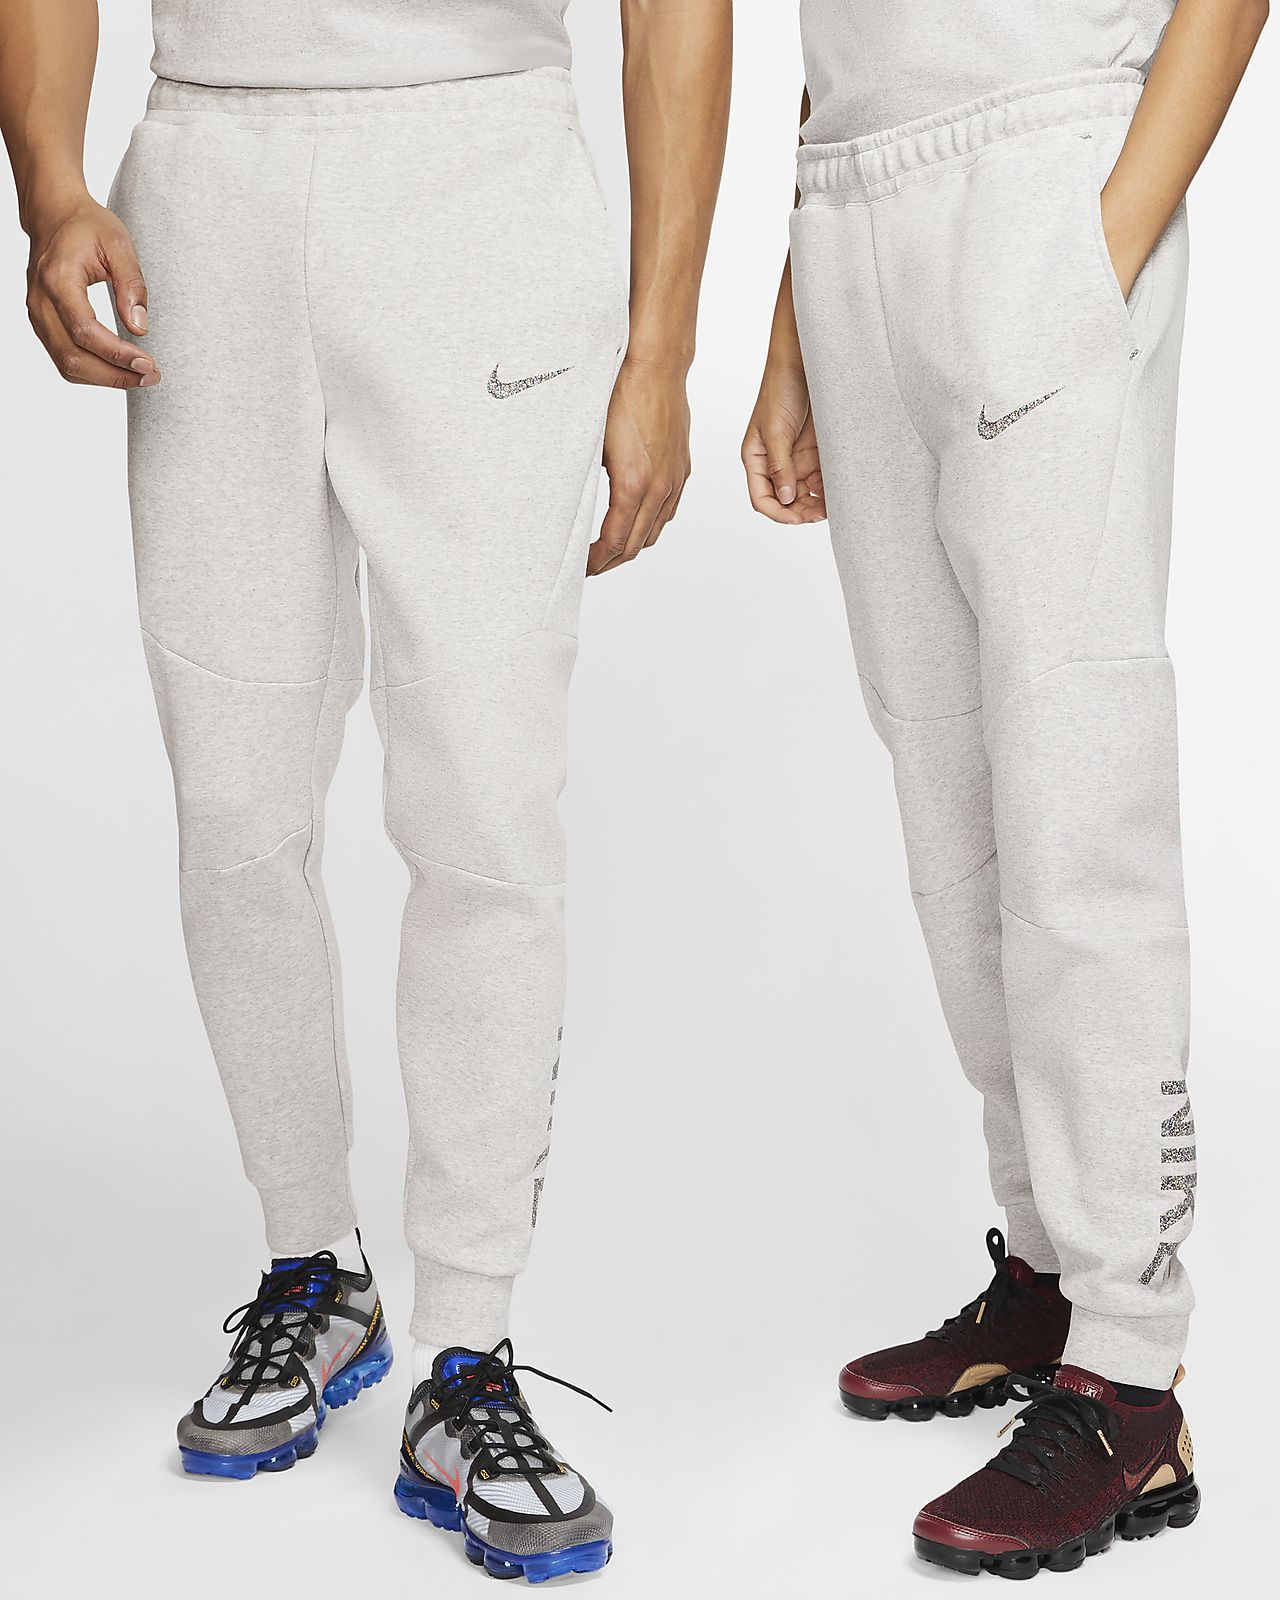 Pantalones deportivos Nike 50